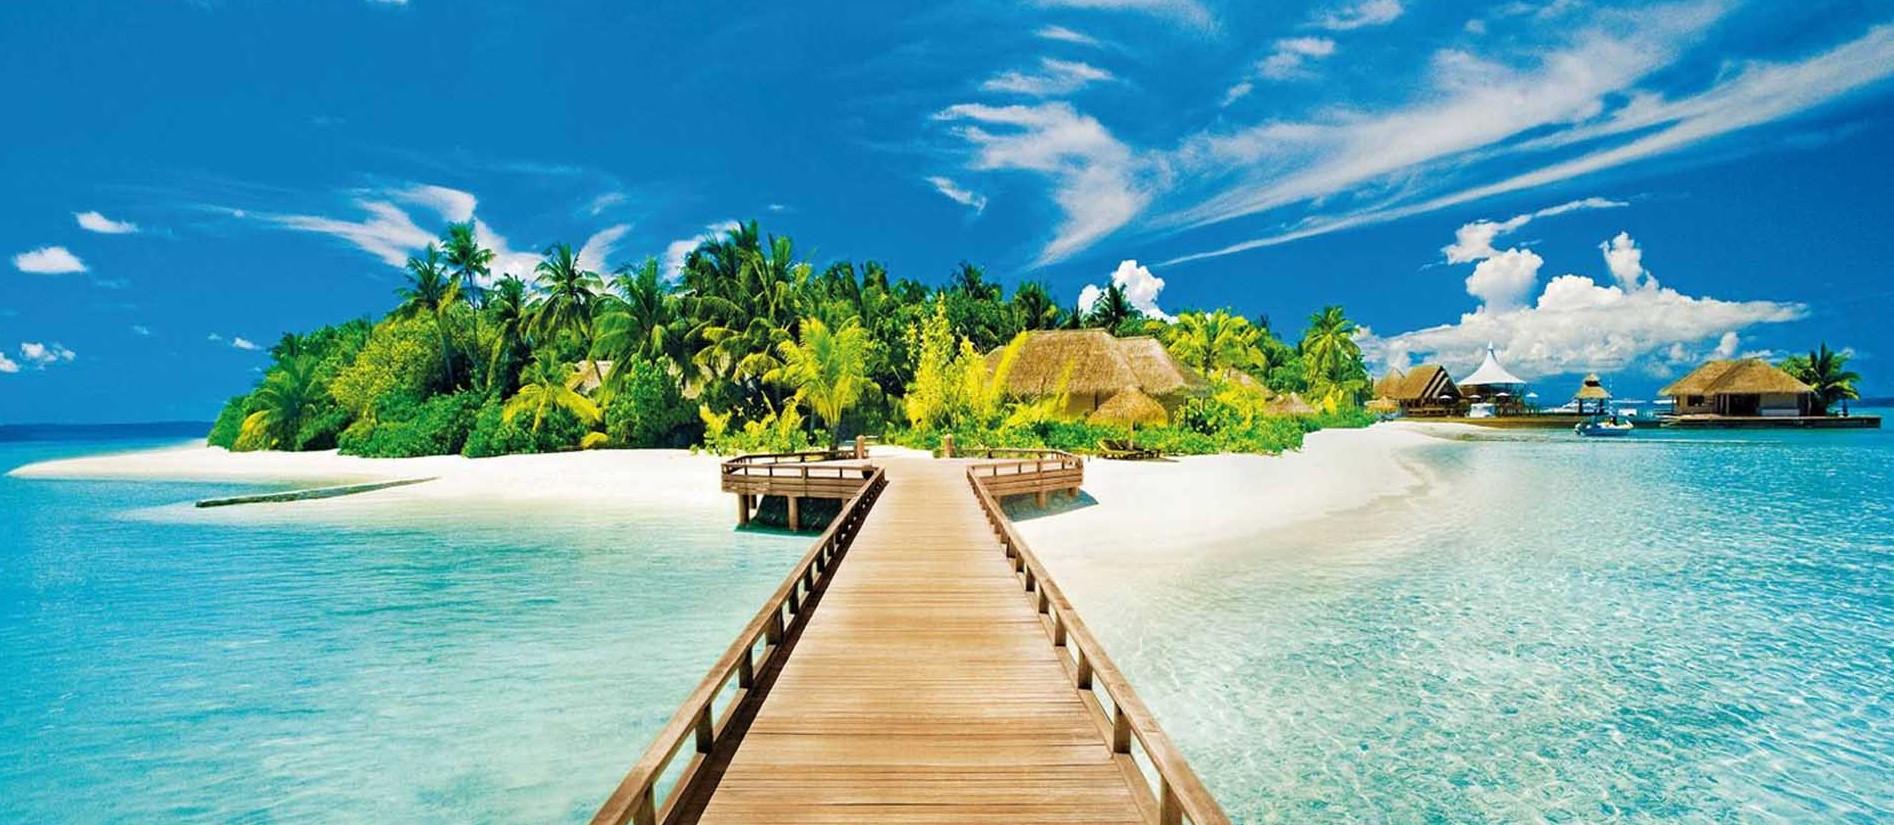 Carta de garantia para visa de turismo Republica Dominicana